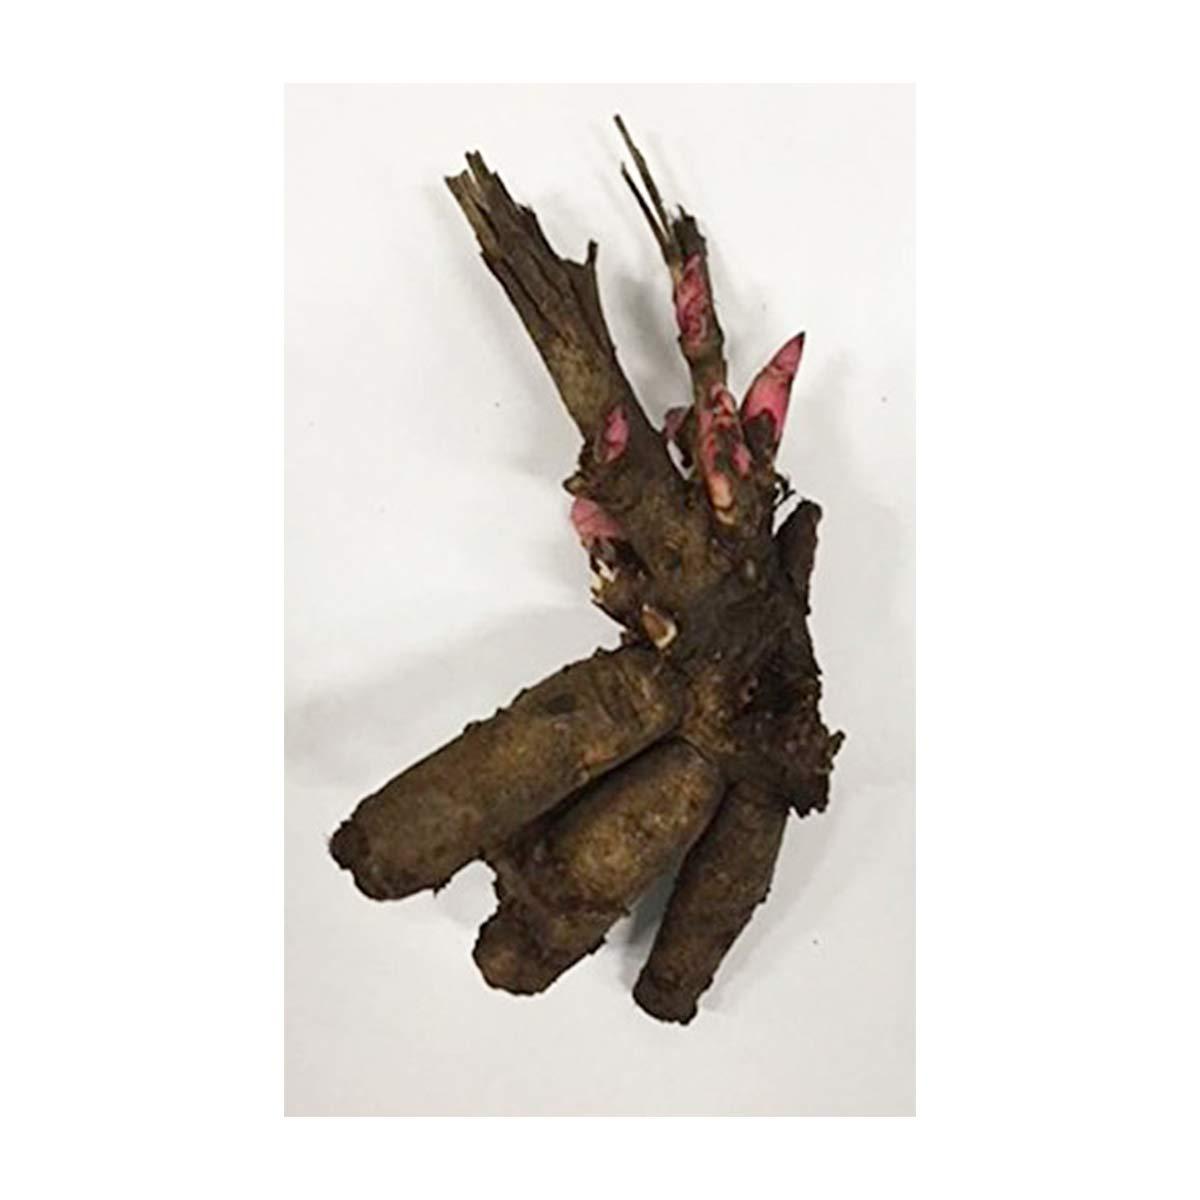 Burpee 'Bartzella' Itoh Perennial Peony - 1 Bare Root 3-5 Eye Plant by Burpee (Image #3)